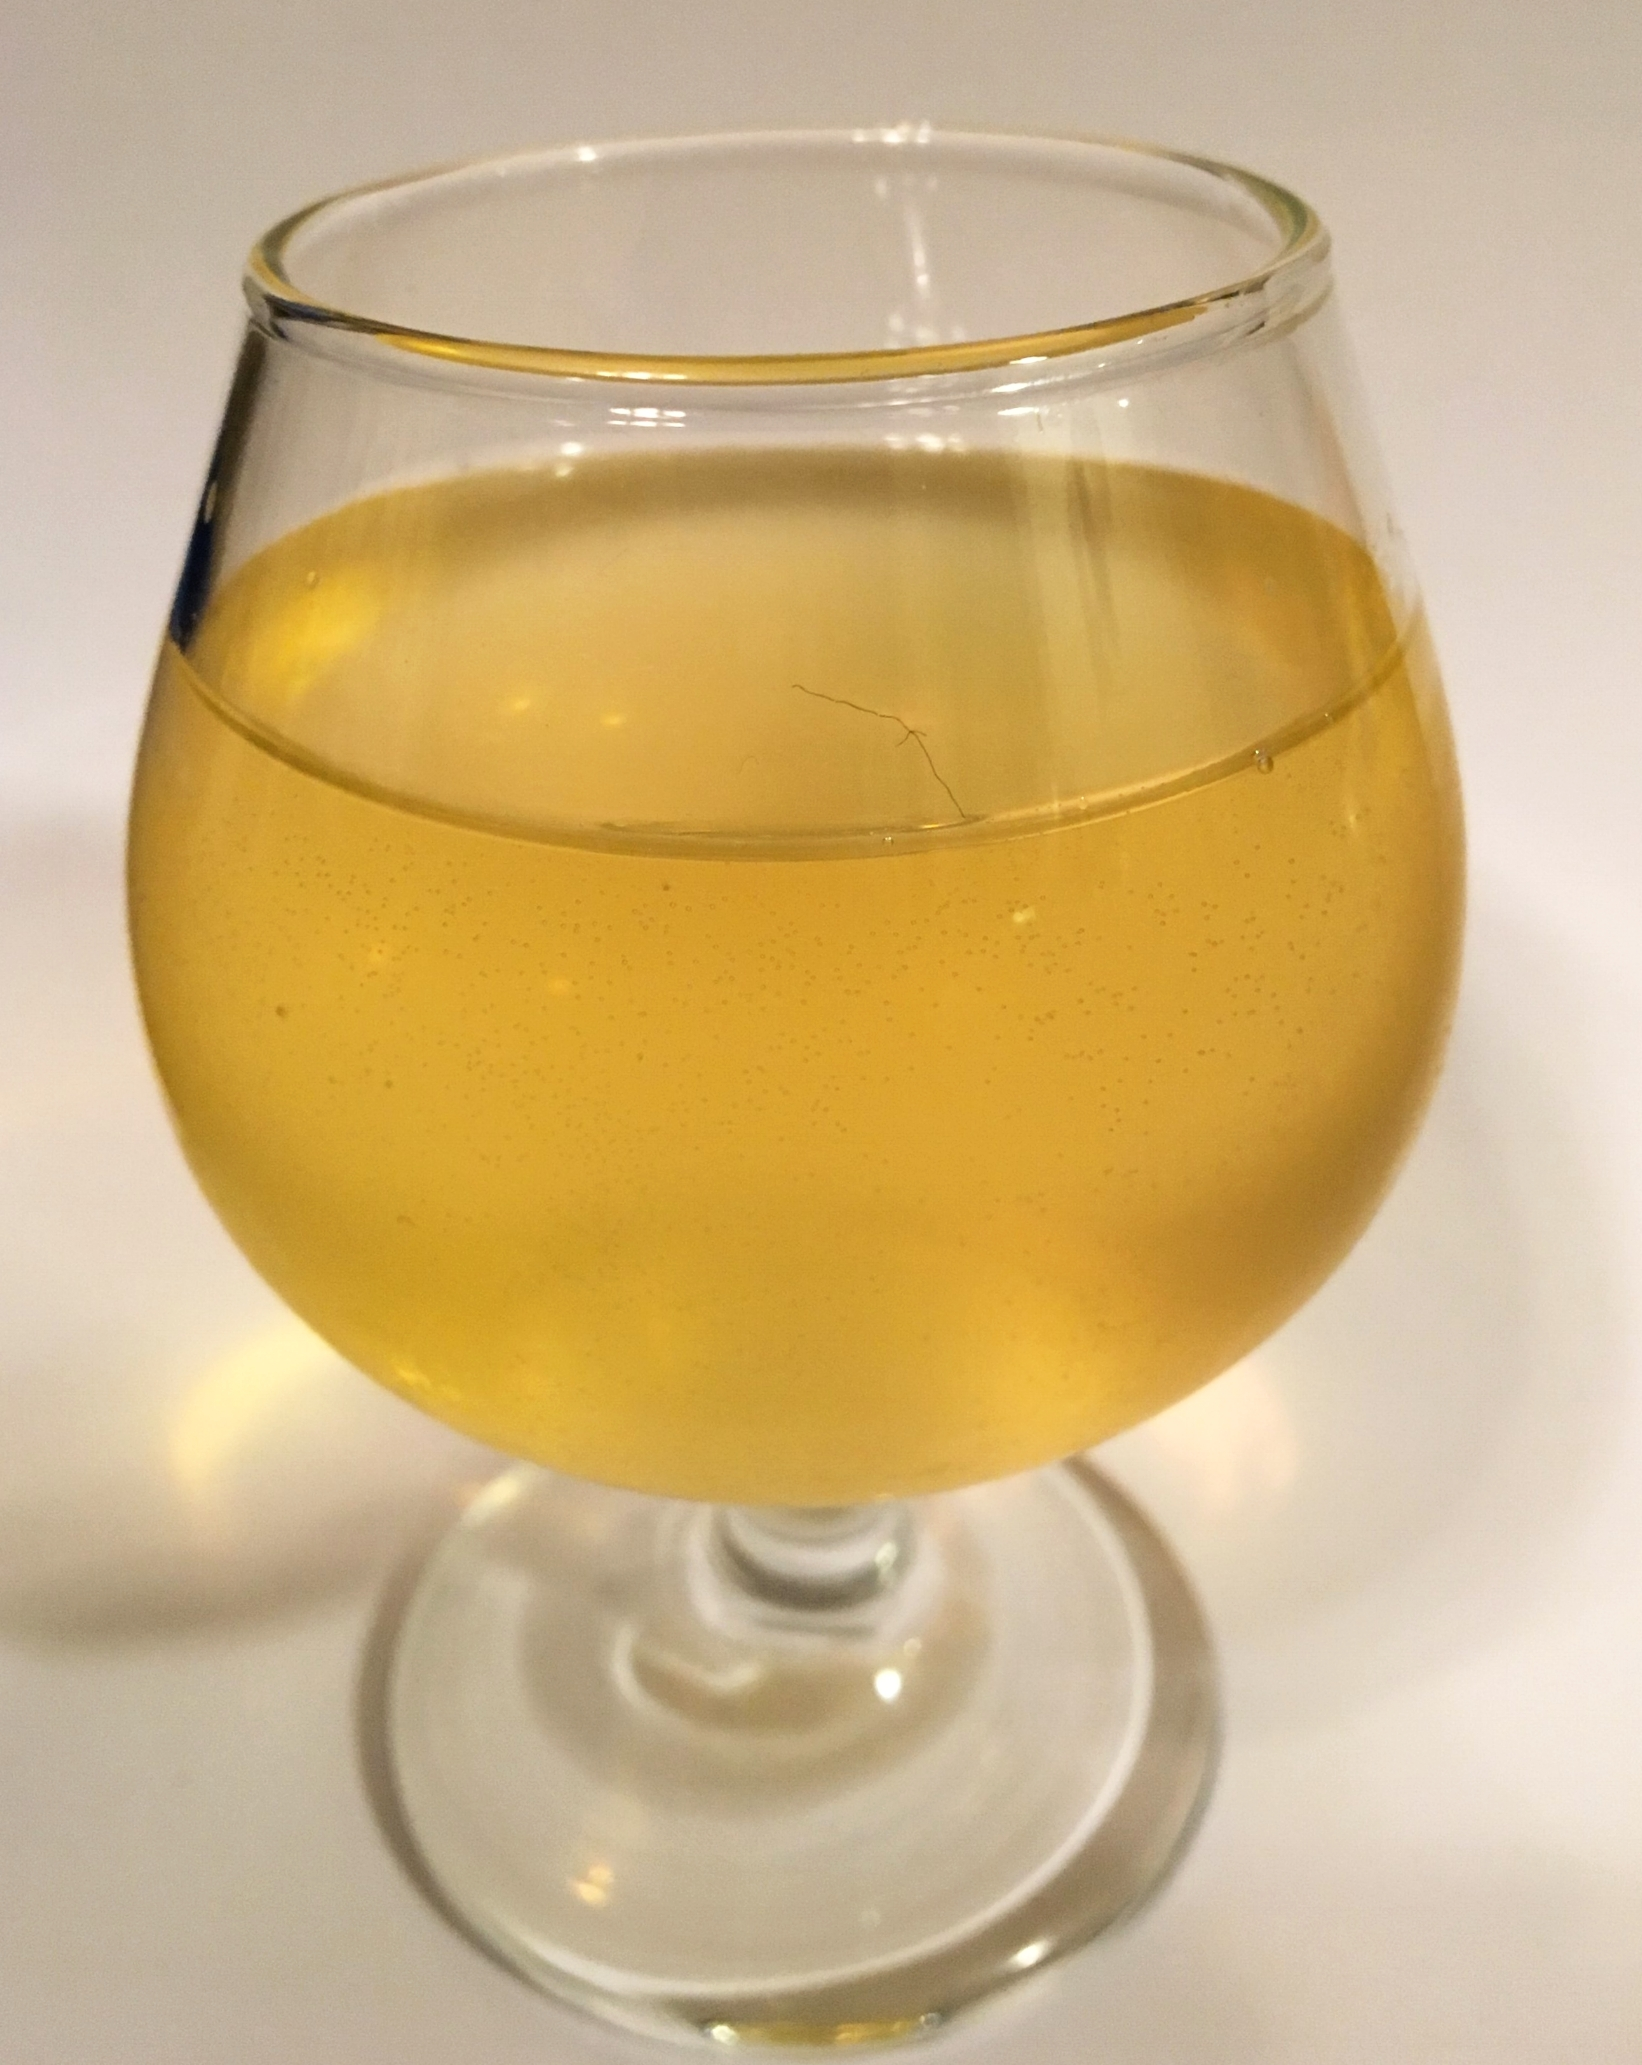 Pitmaston Pineapple Cider